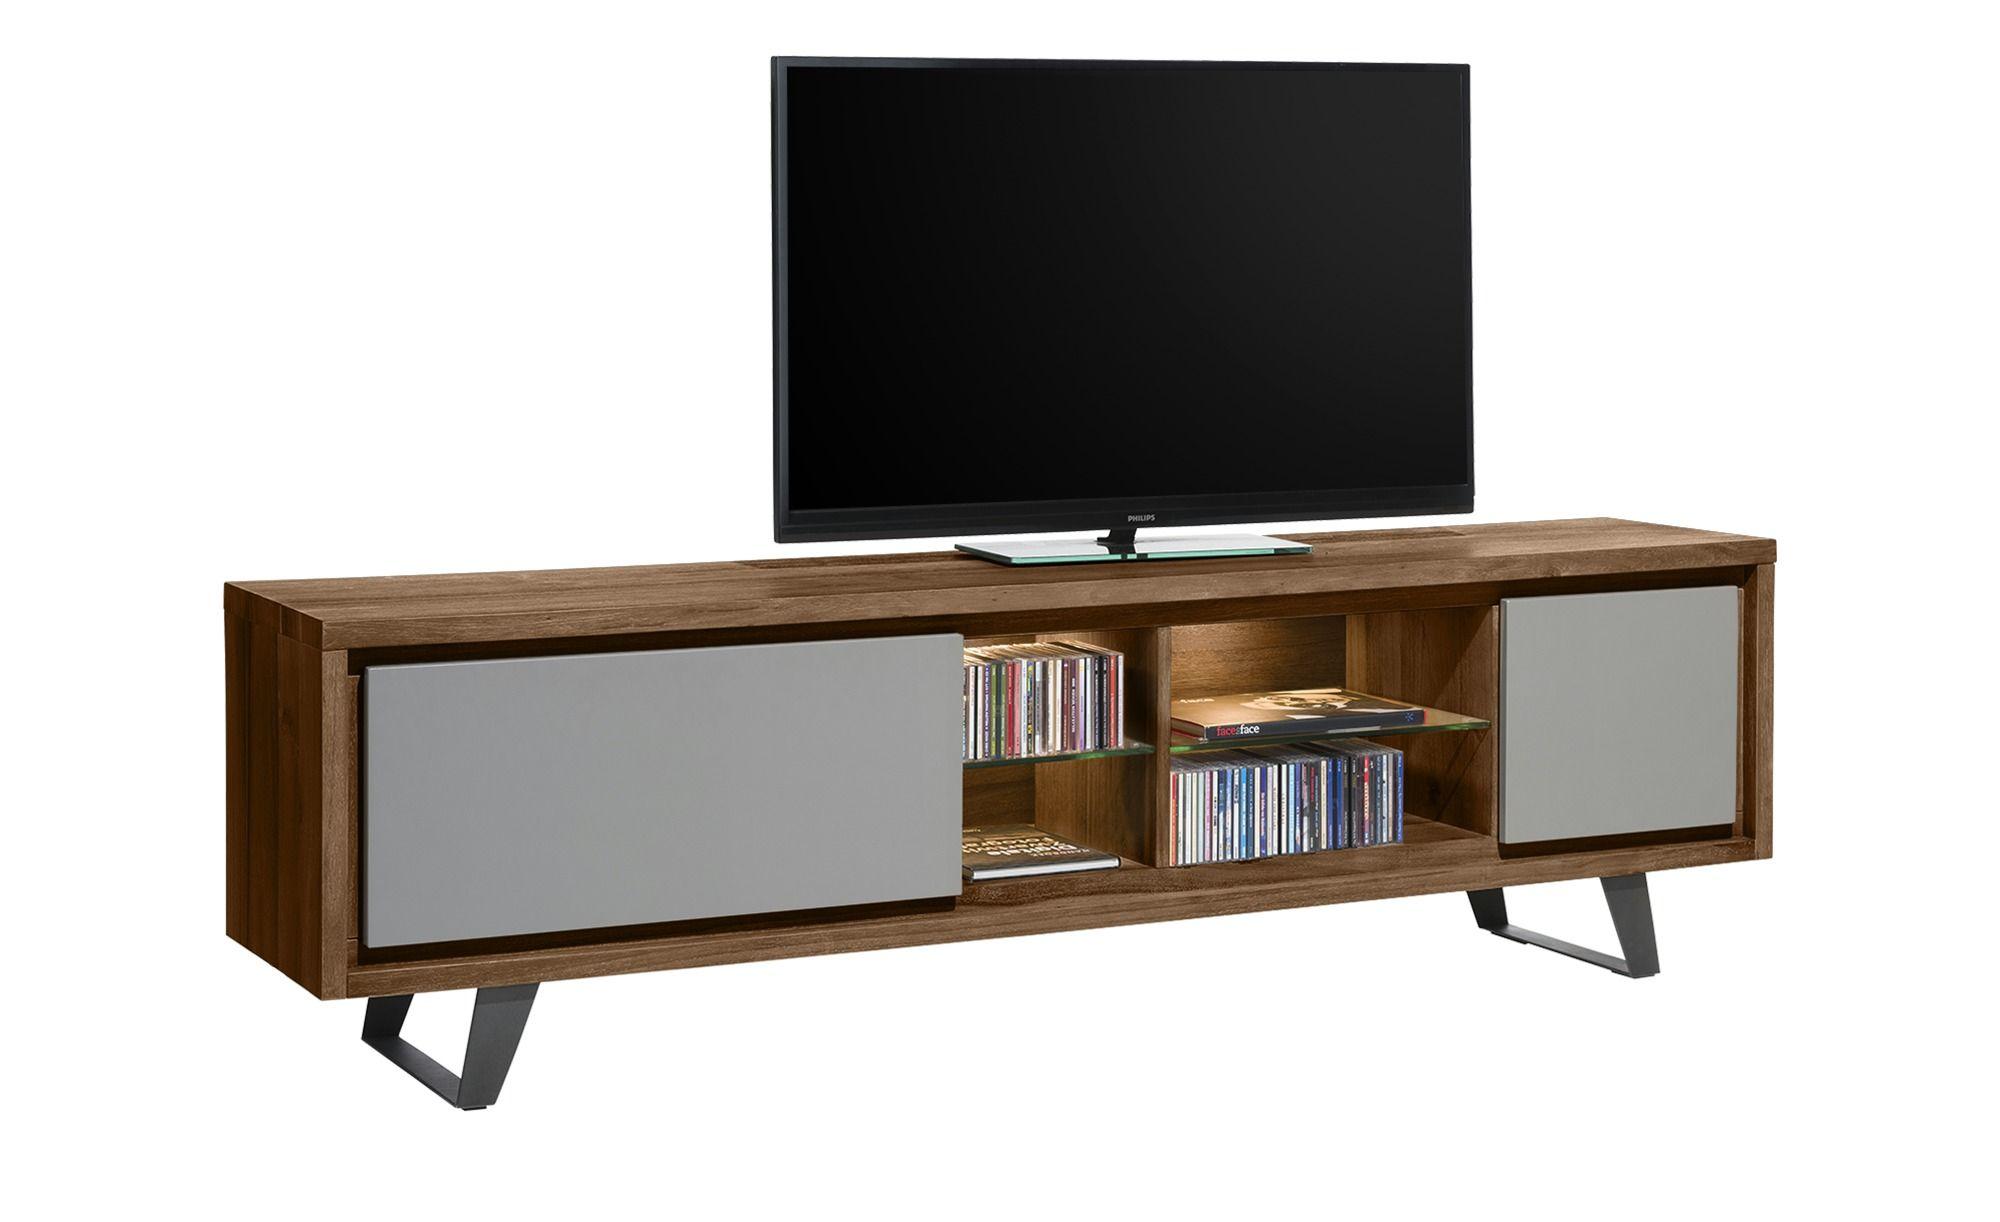 Fernsehschrank Geschlossen Gunstig Kaufen Fernsehschrank